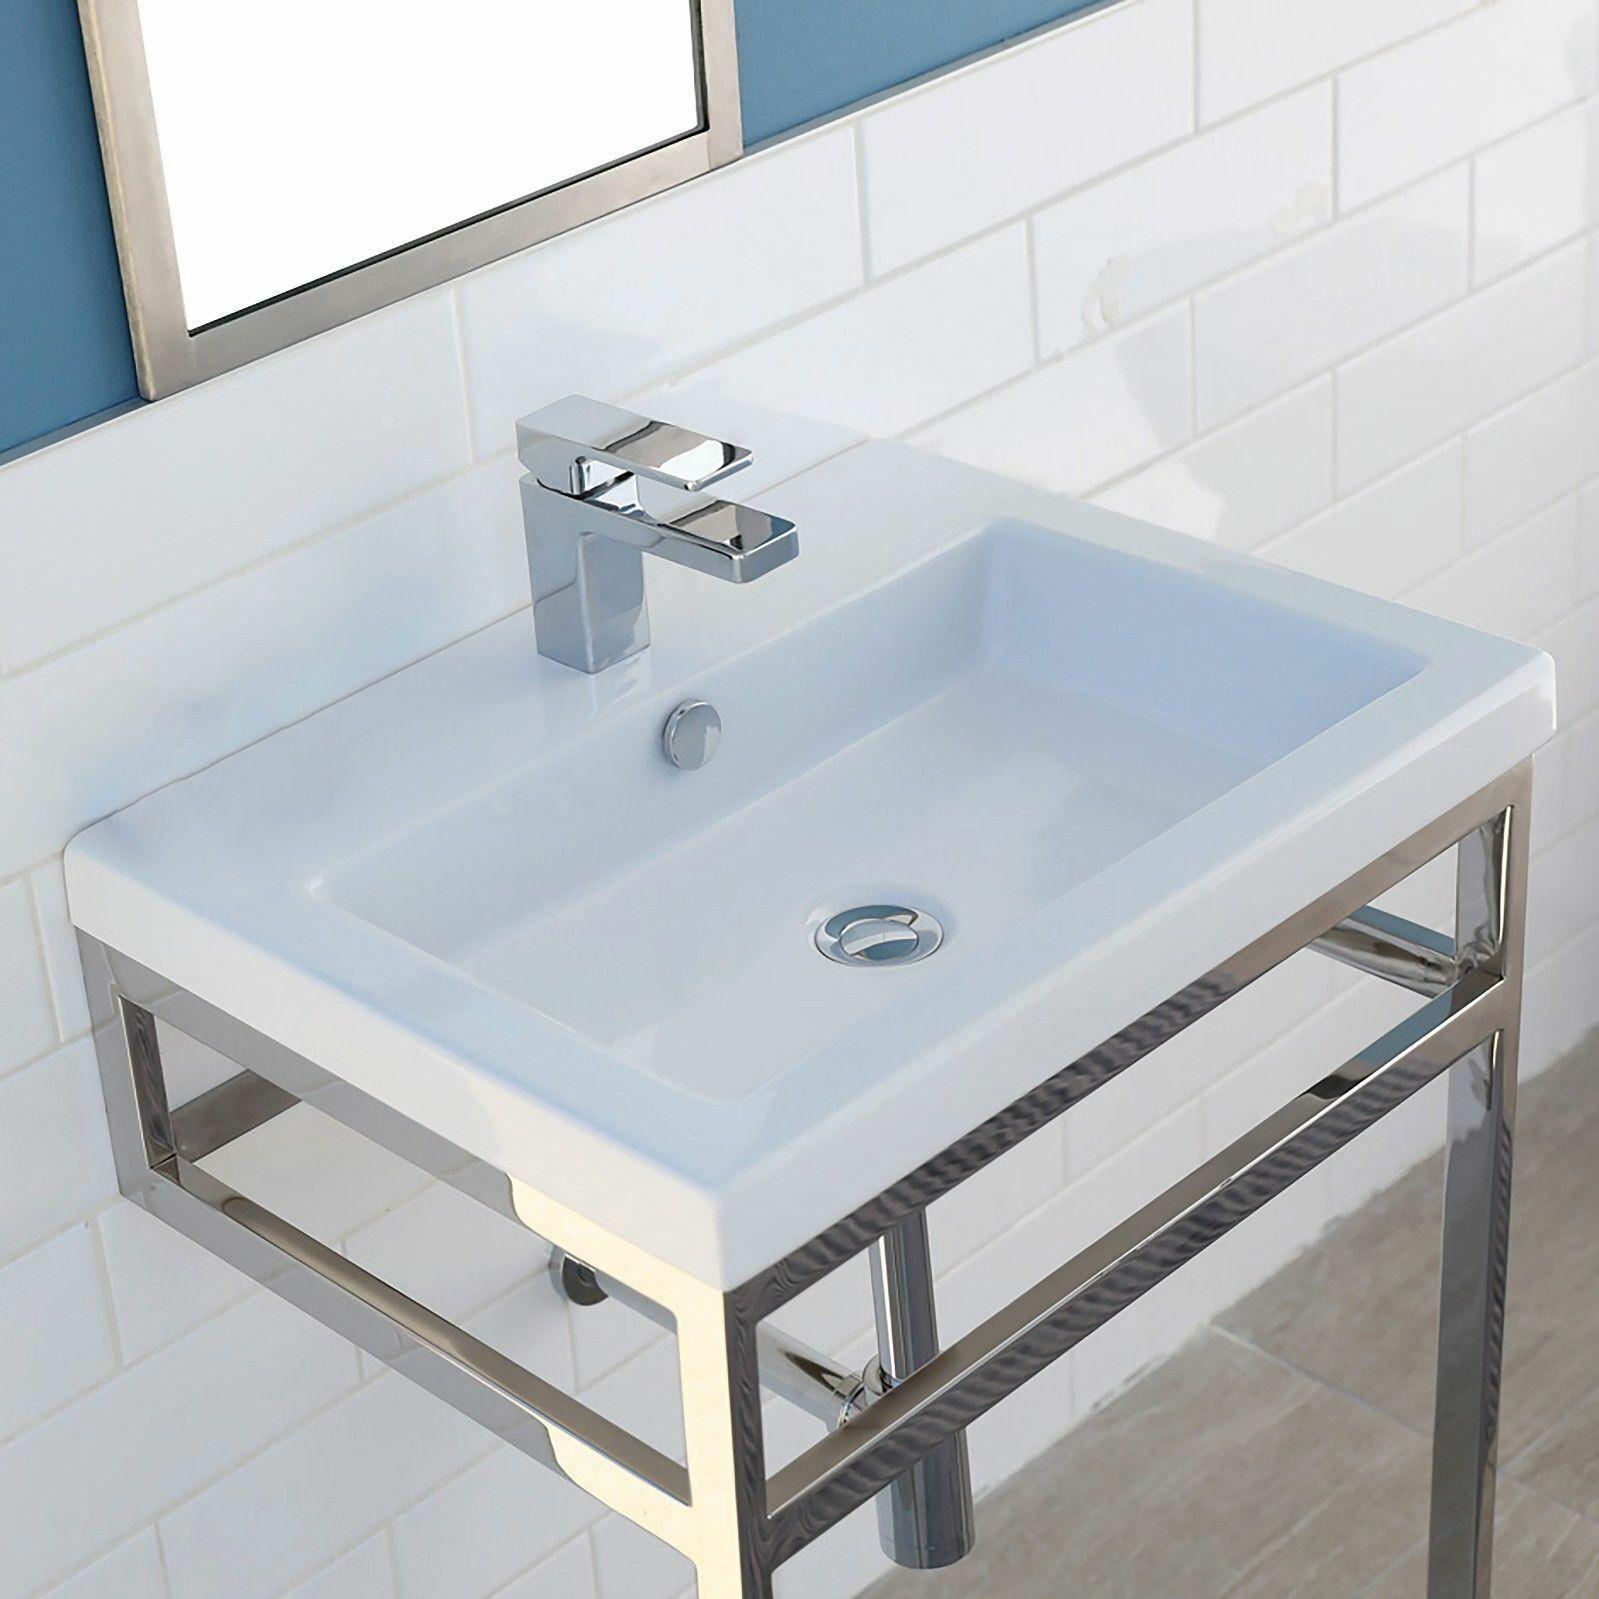 Aquaquattro Lacava Wall Mount Luxury Bathroom Sinks 5211 03 White Luxury Bathroom Sinks Wall Mounted Bathroom Sinks Luxury Bathroom